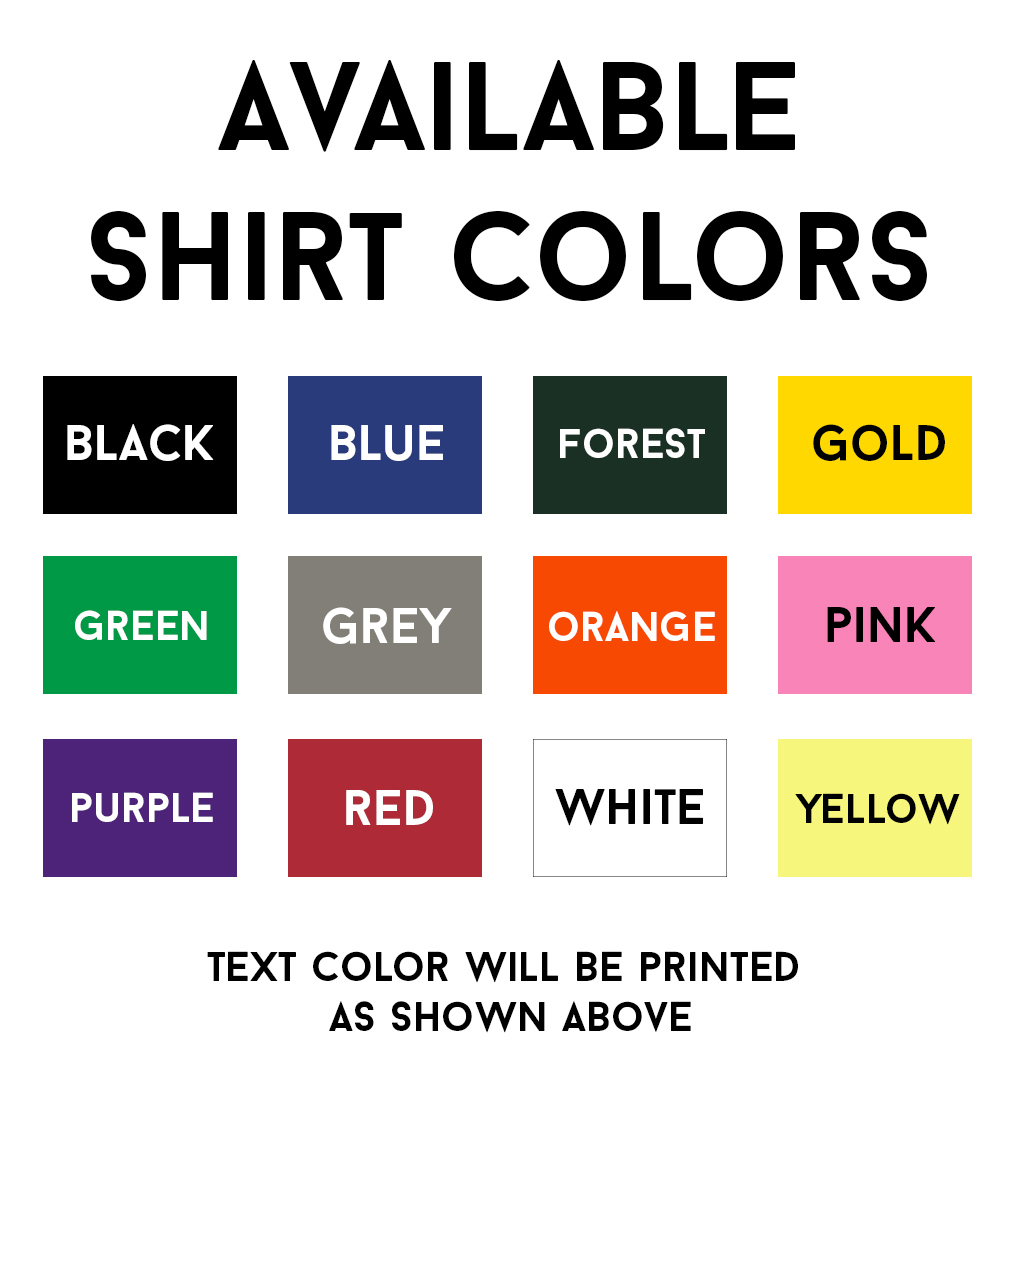 #wilson - Hashtag Men's Adult Short Sleeve T-Shirt